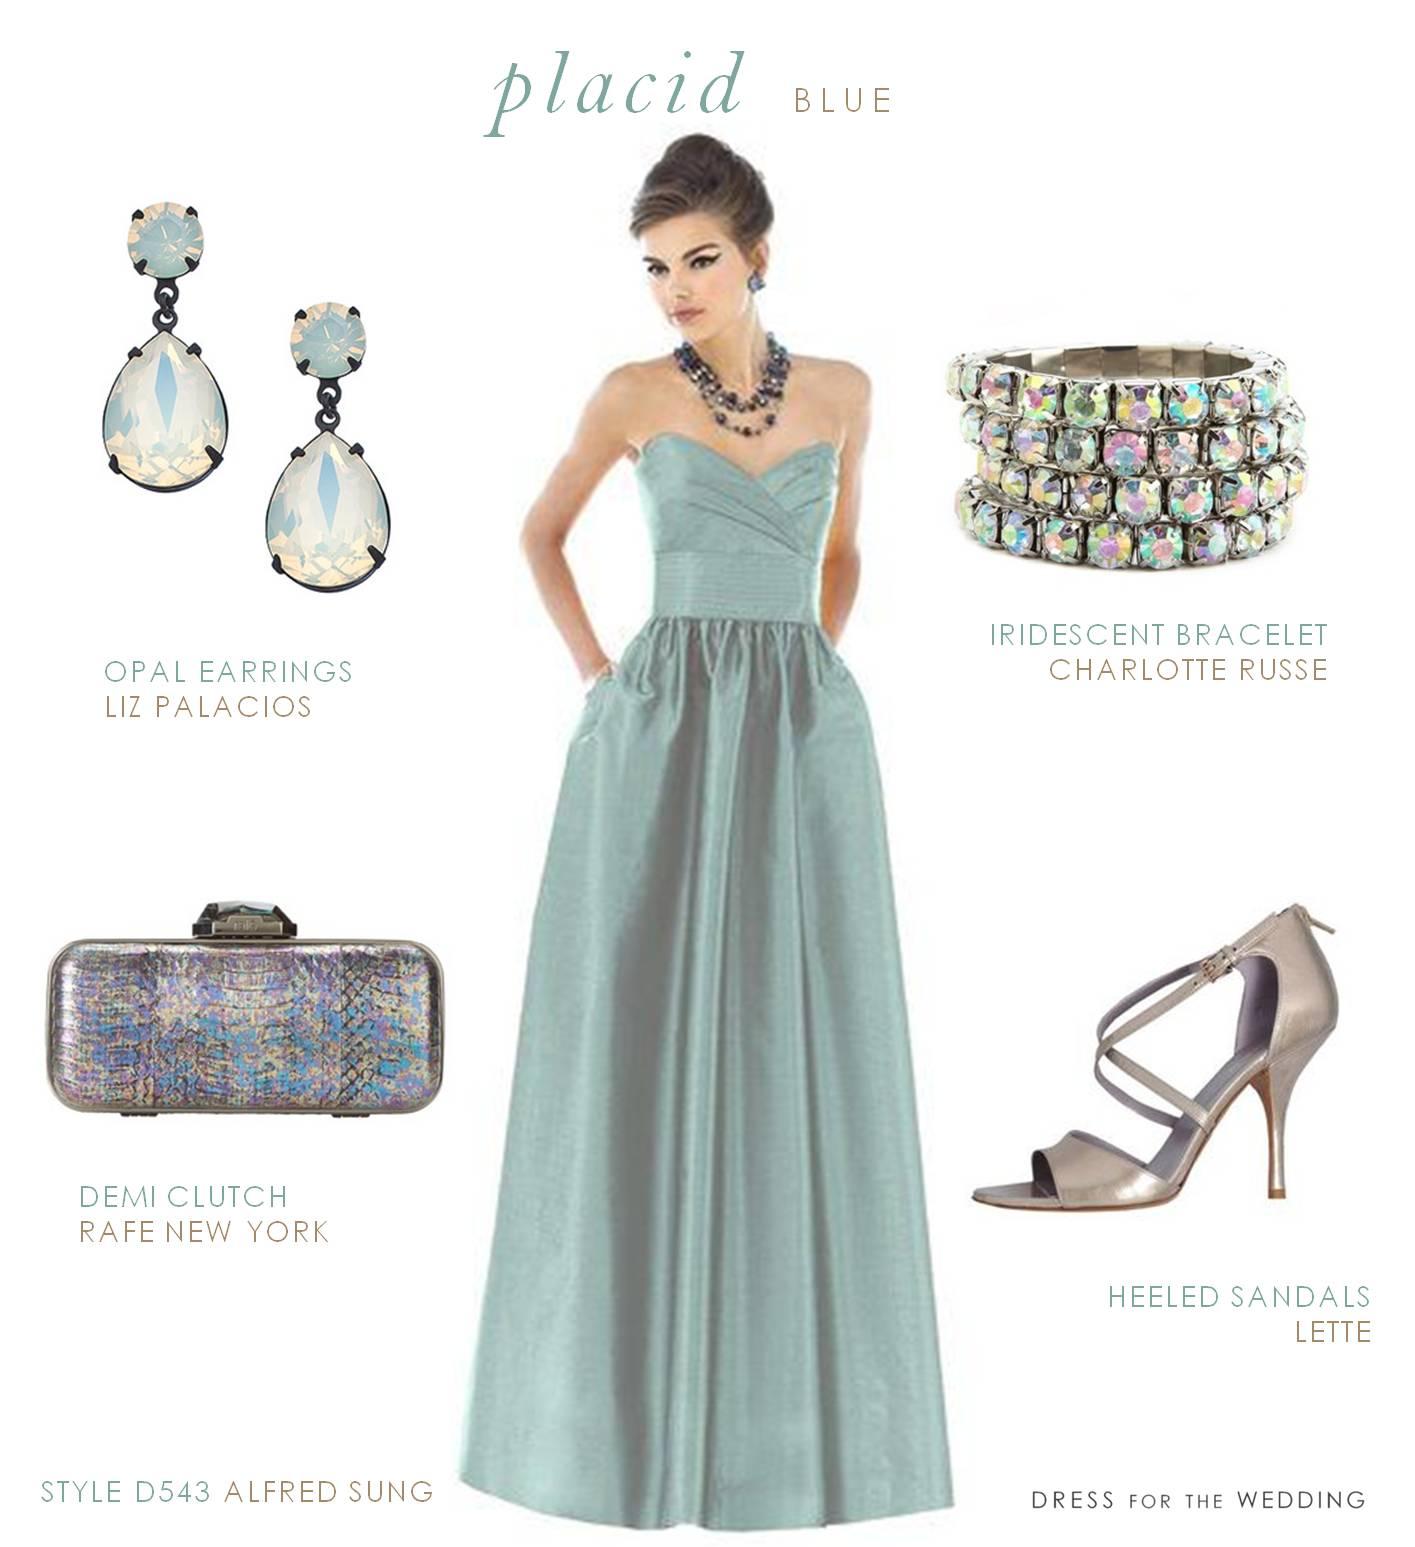 Placid Blue Bridesmaid Dress